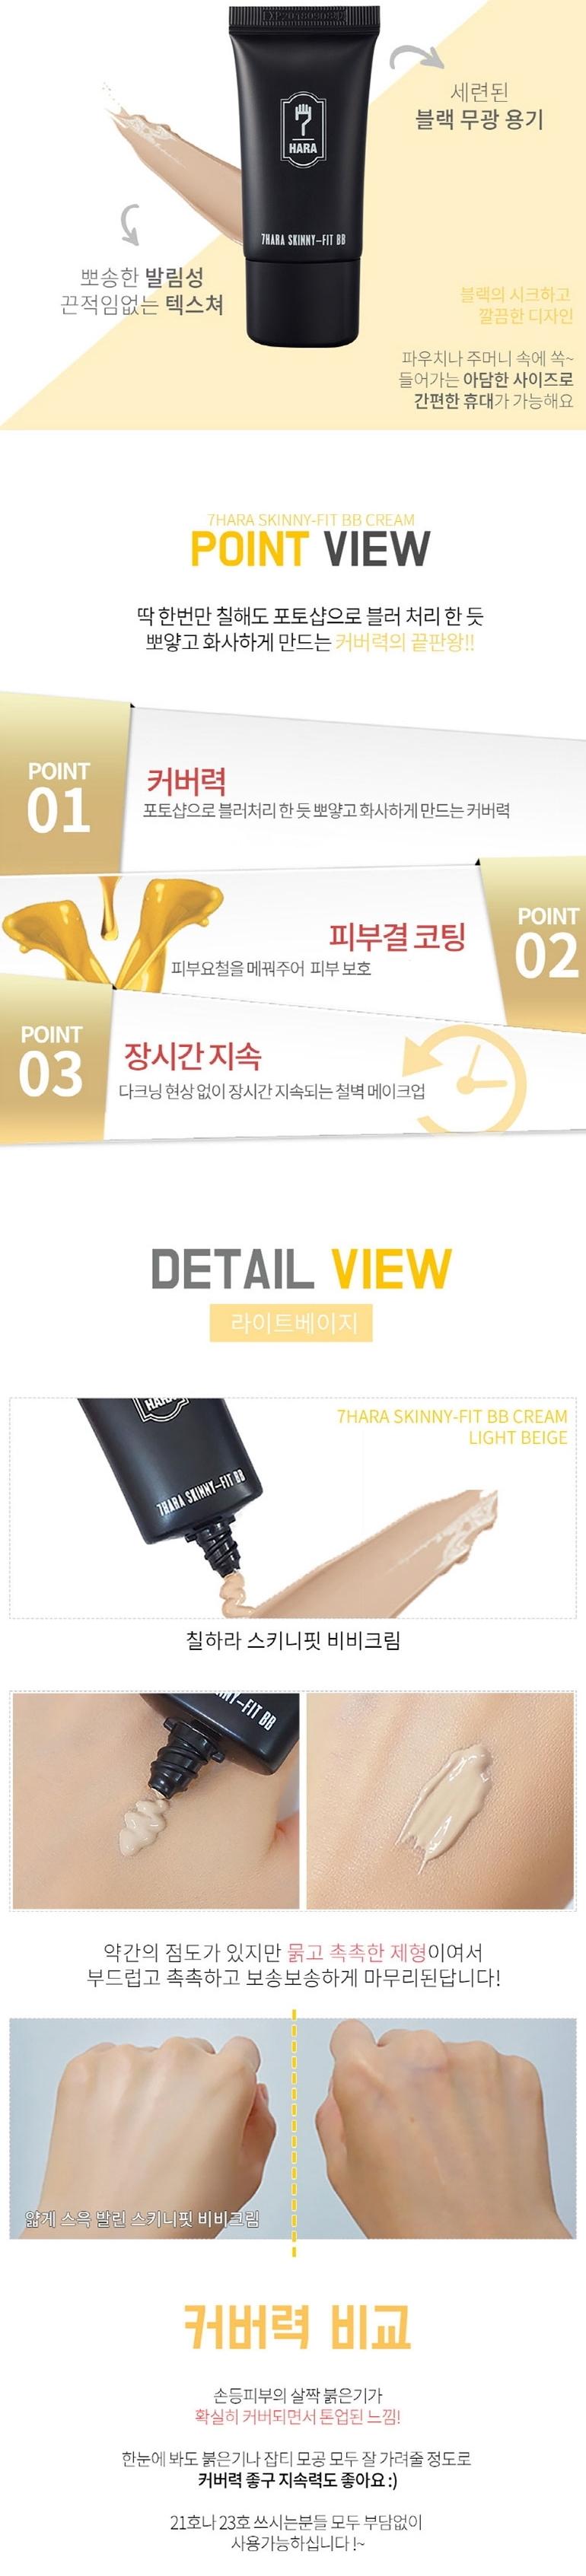 review-15301690716-0889d-1-.jpg